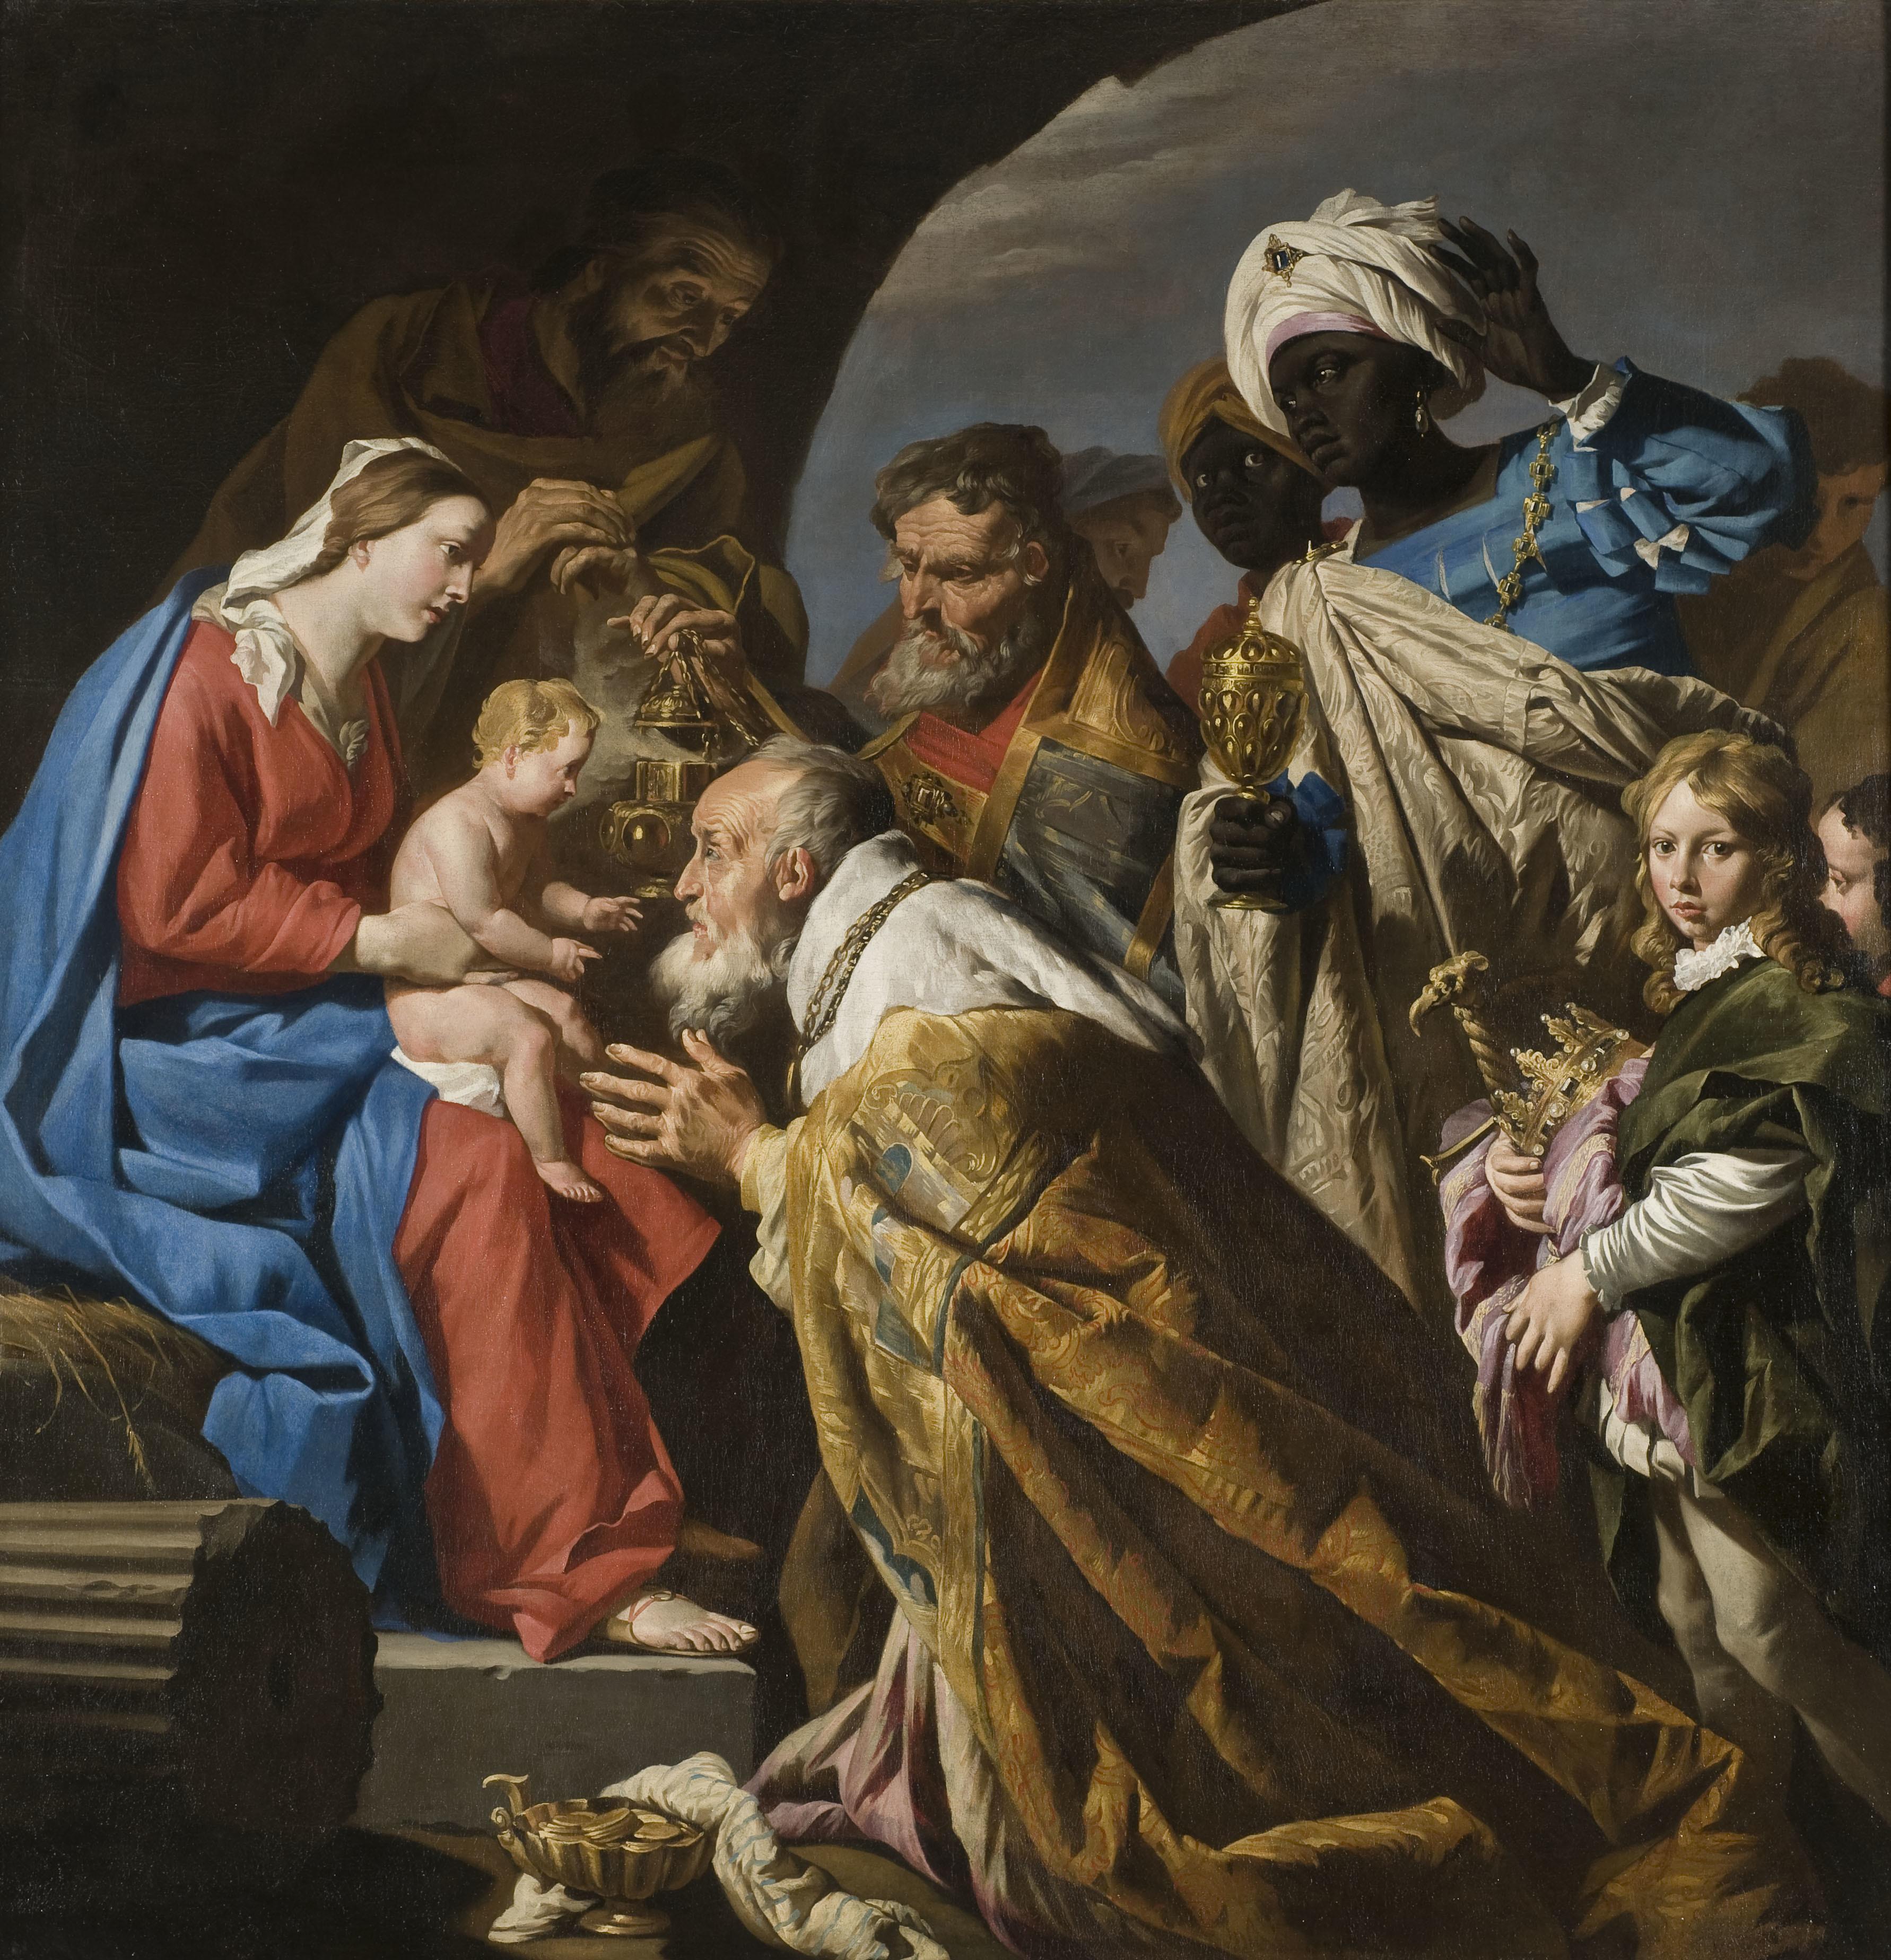 File:Matthias stom the adoration of the magi.jpg - Wikimedia Commons